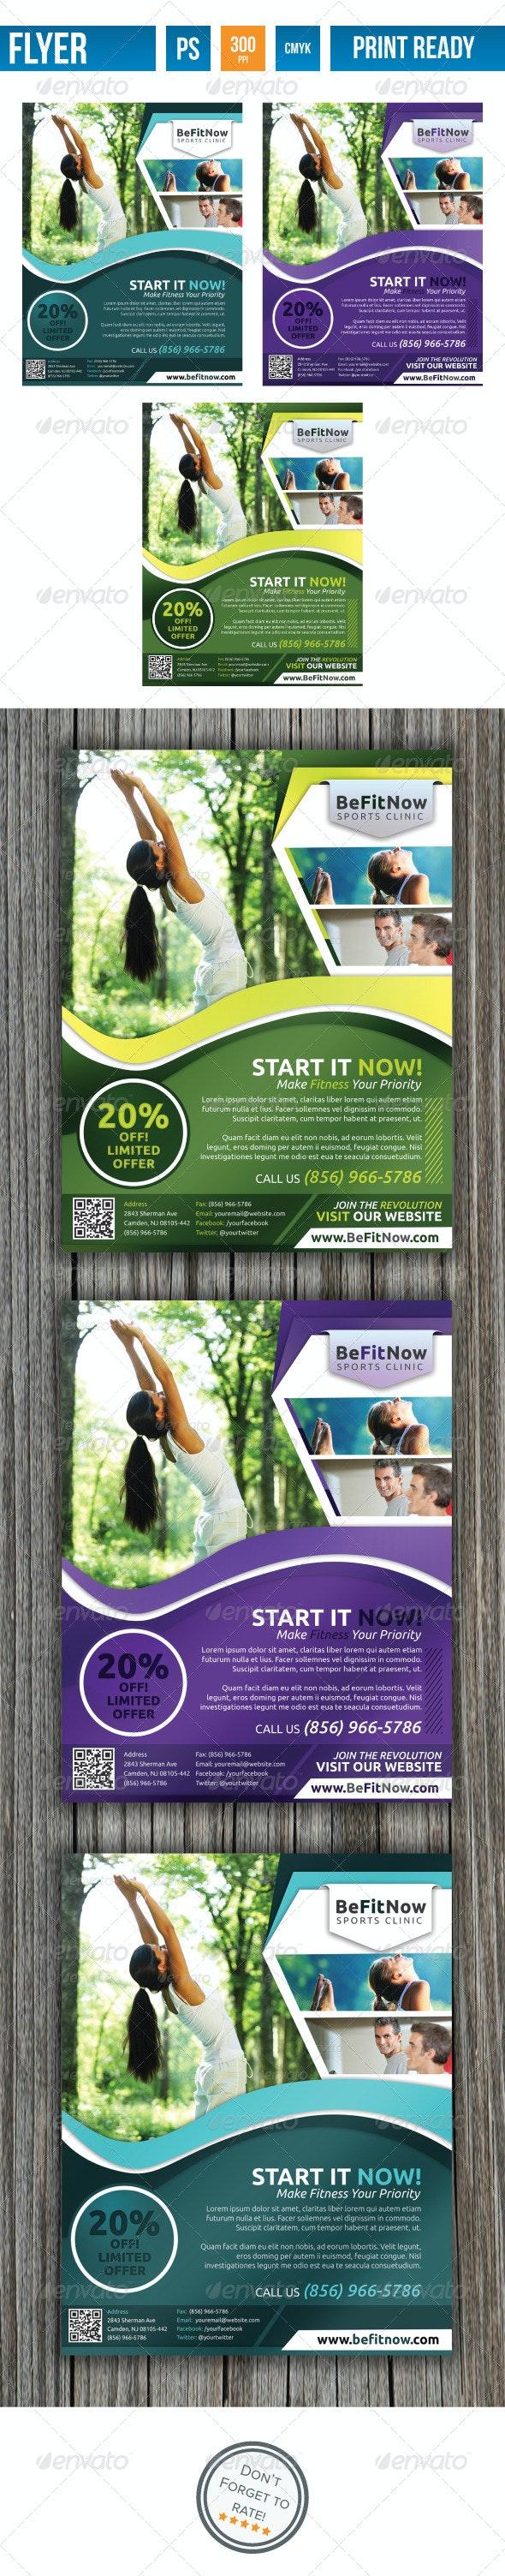 Fitness Flyer V2 - Flyers Print Templates